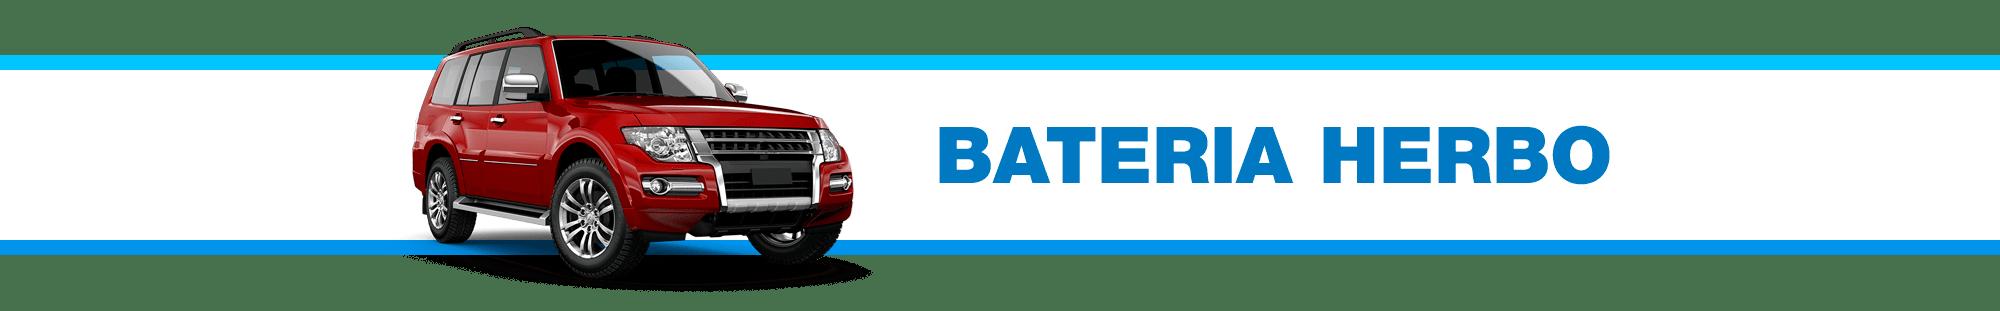 sv-baterias-bateria-herbo-carro